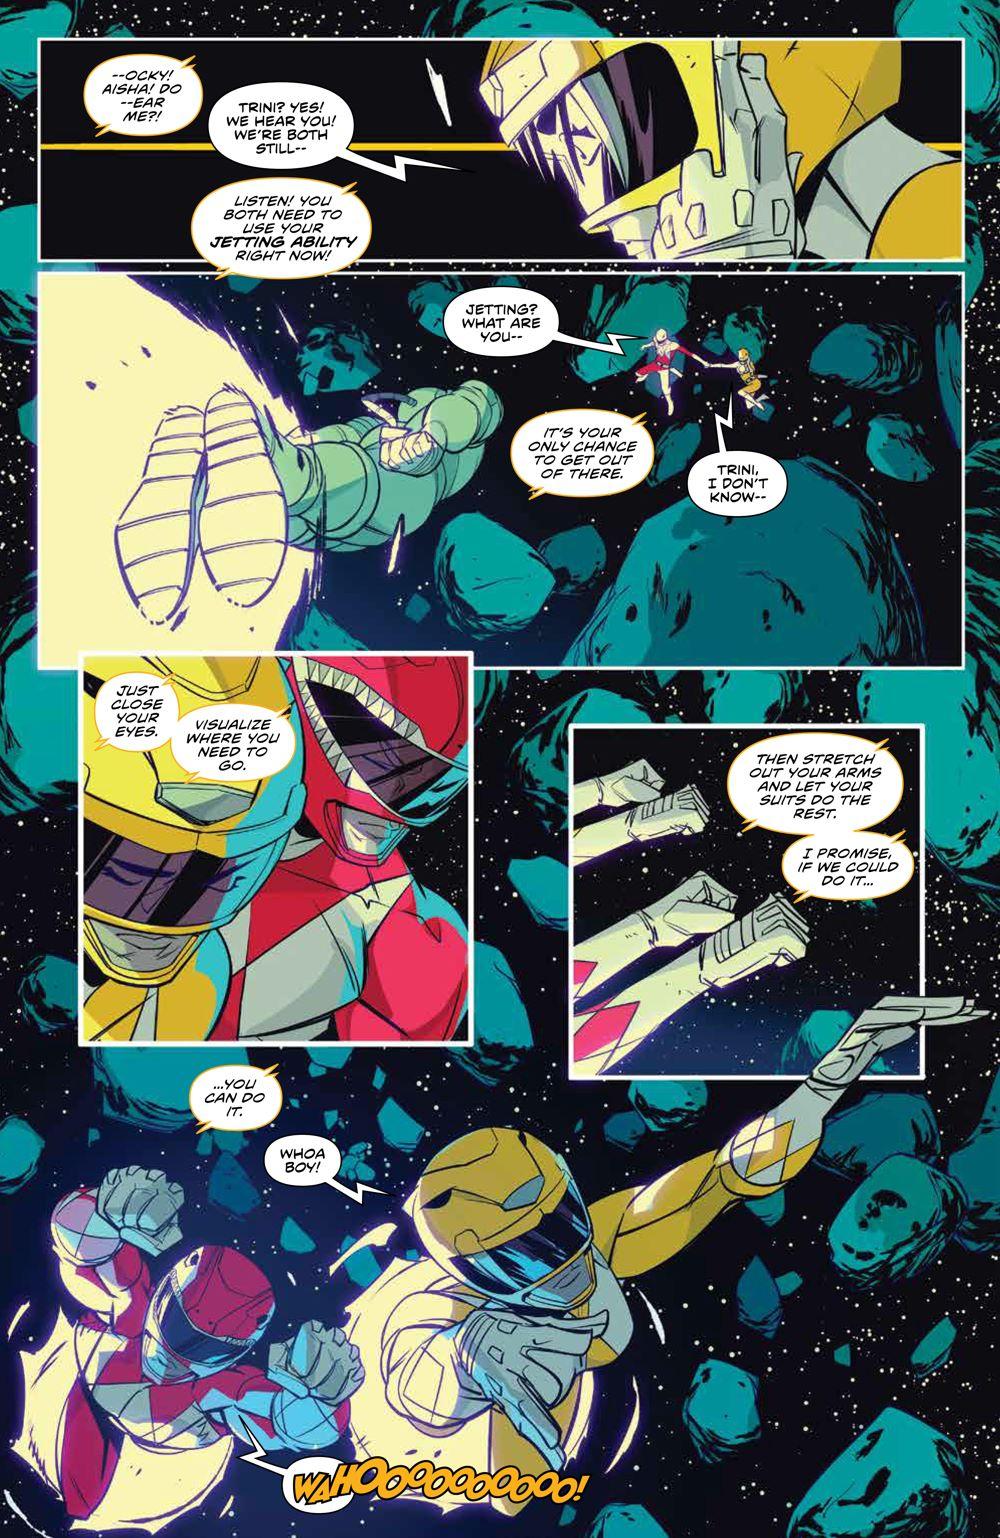 MMPR_v13_SC_PRESS_14 ComicList Previews: MIGHTY MORPHIN POWER RANGERS VOLUME 13 TP